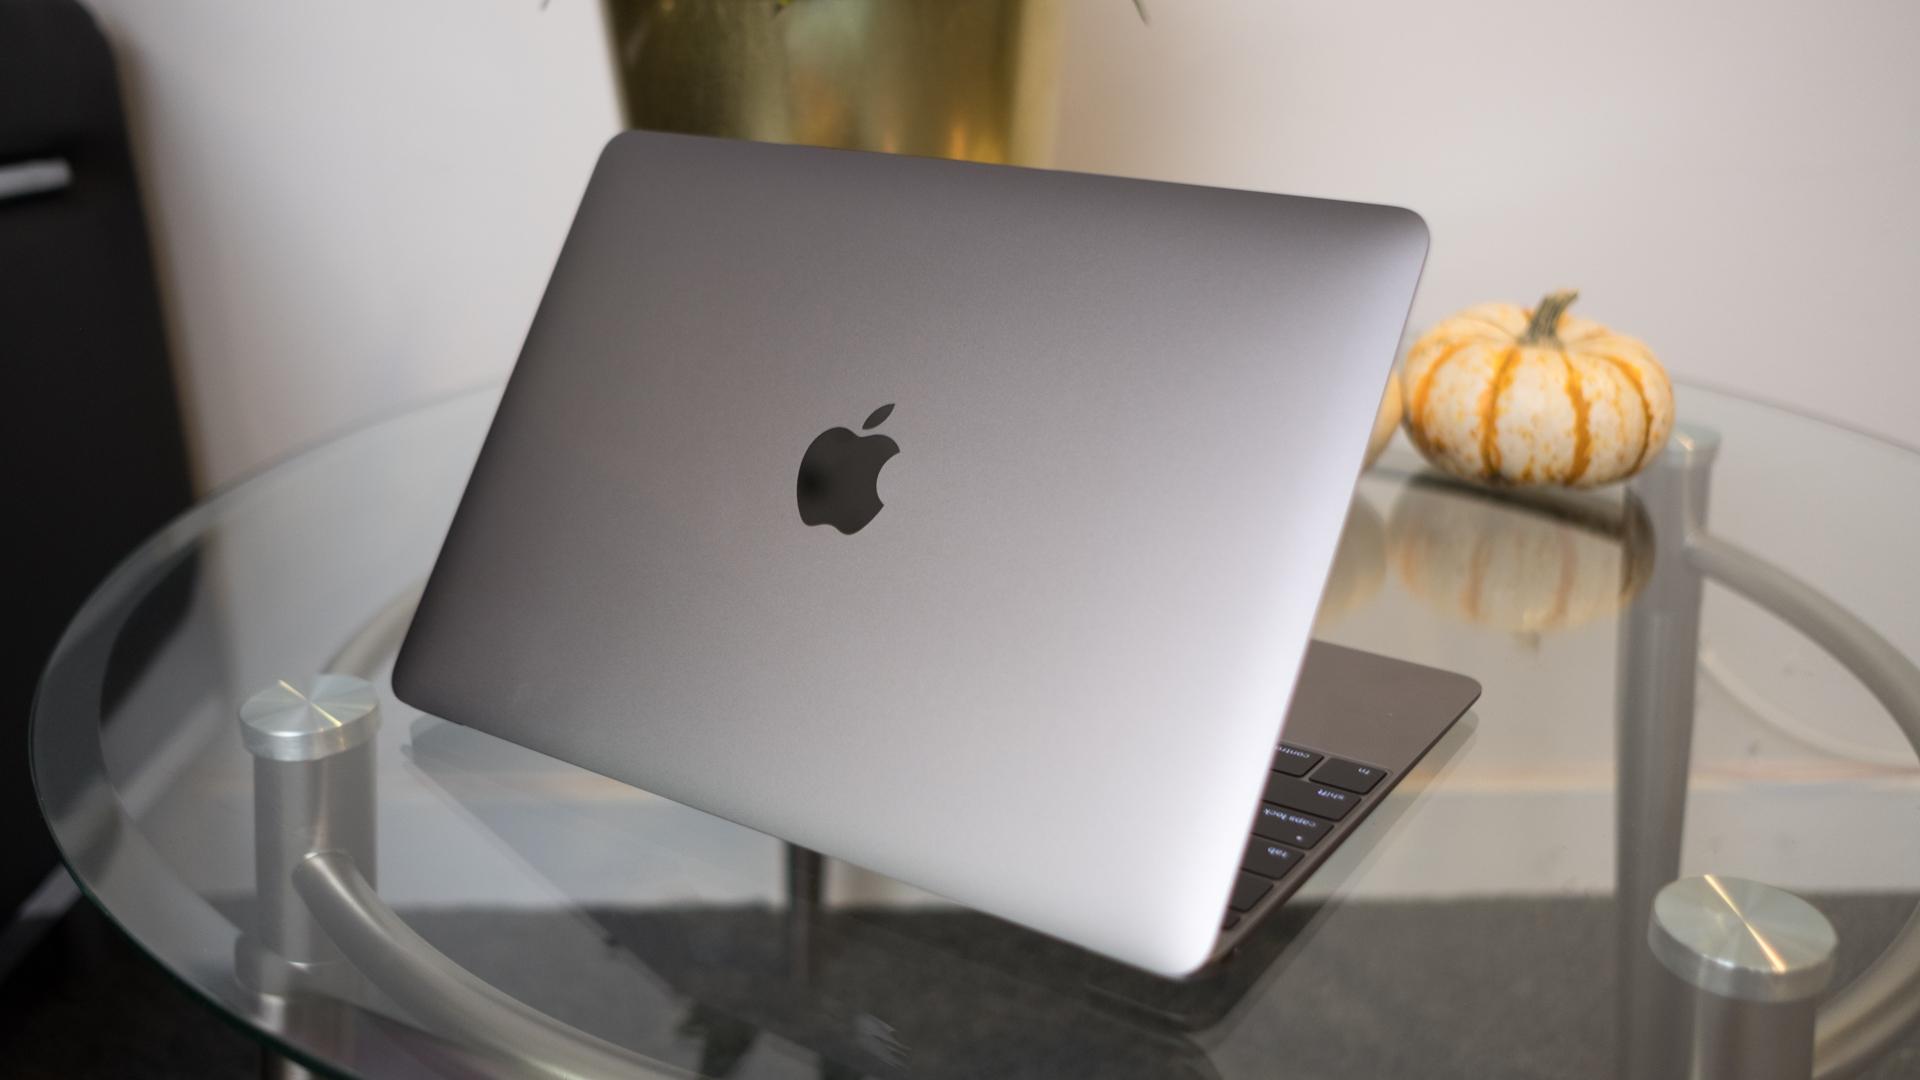 macbook 2018 release date news and rumors techradar